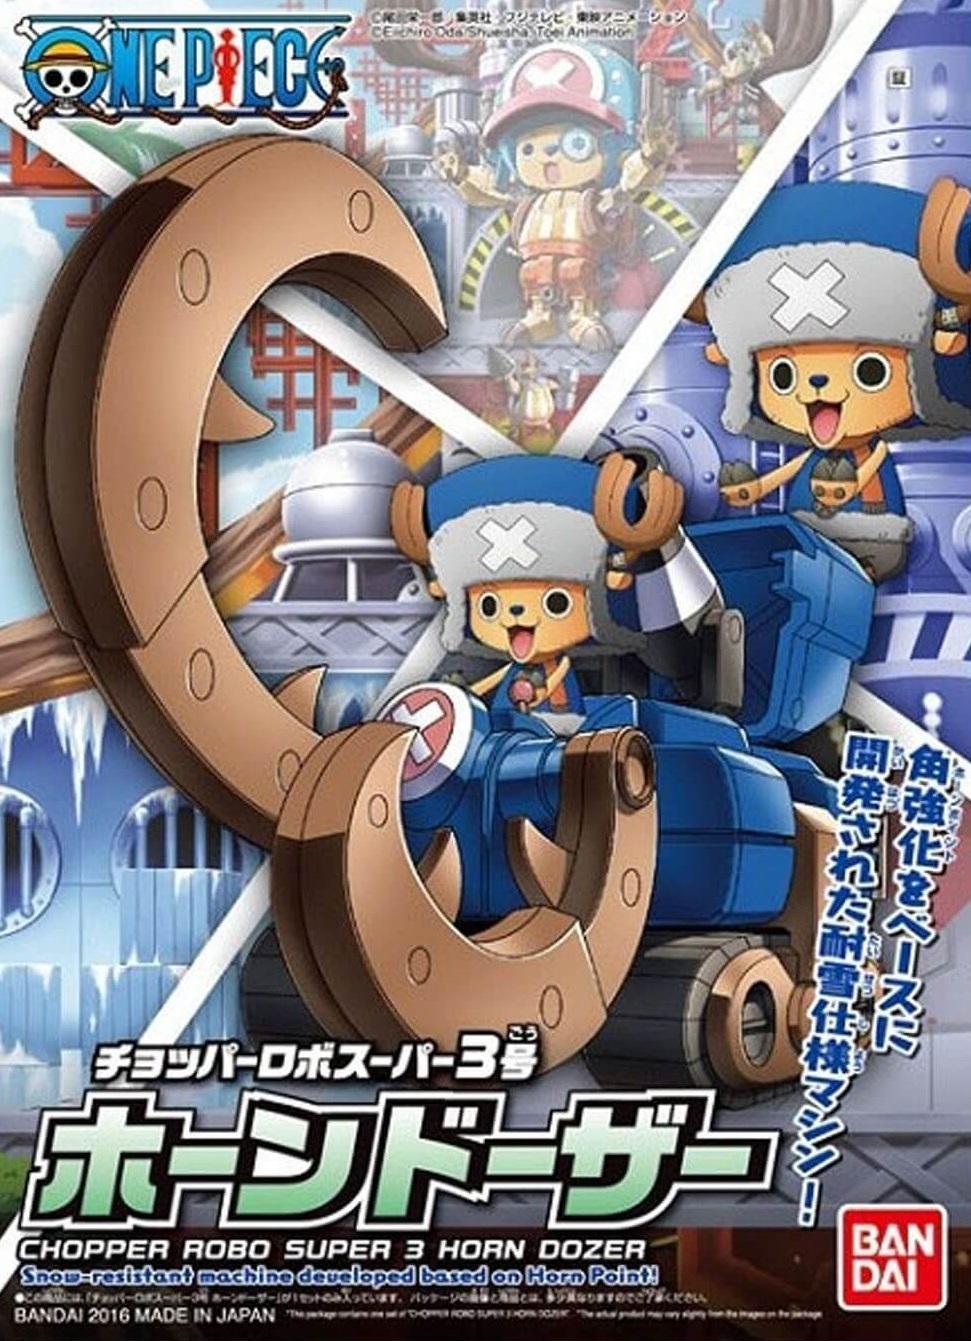 ONE PIECE - Model Kit - Chopper Robo Super 3 Horn Dozer - 10 CM